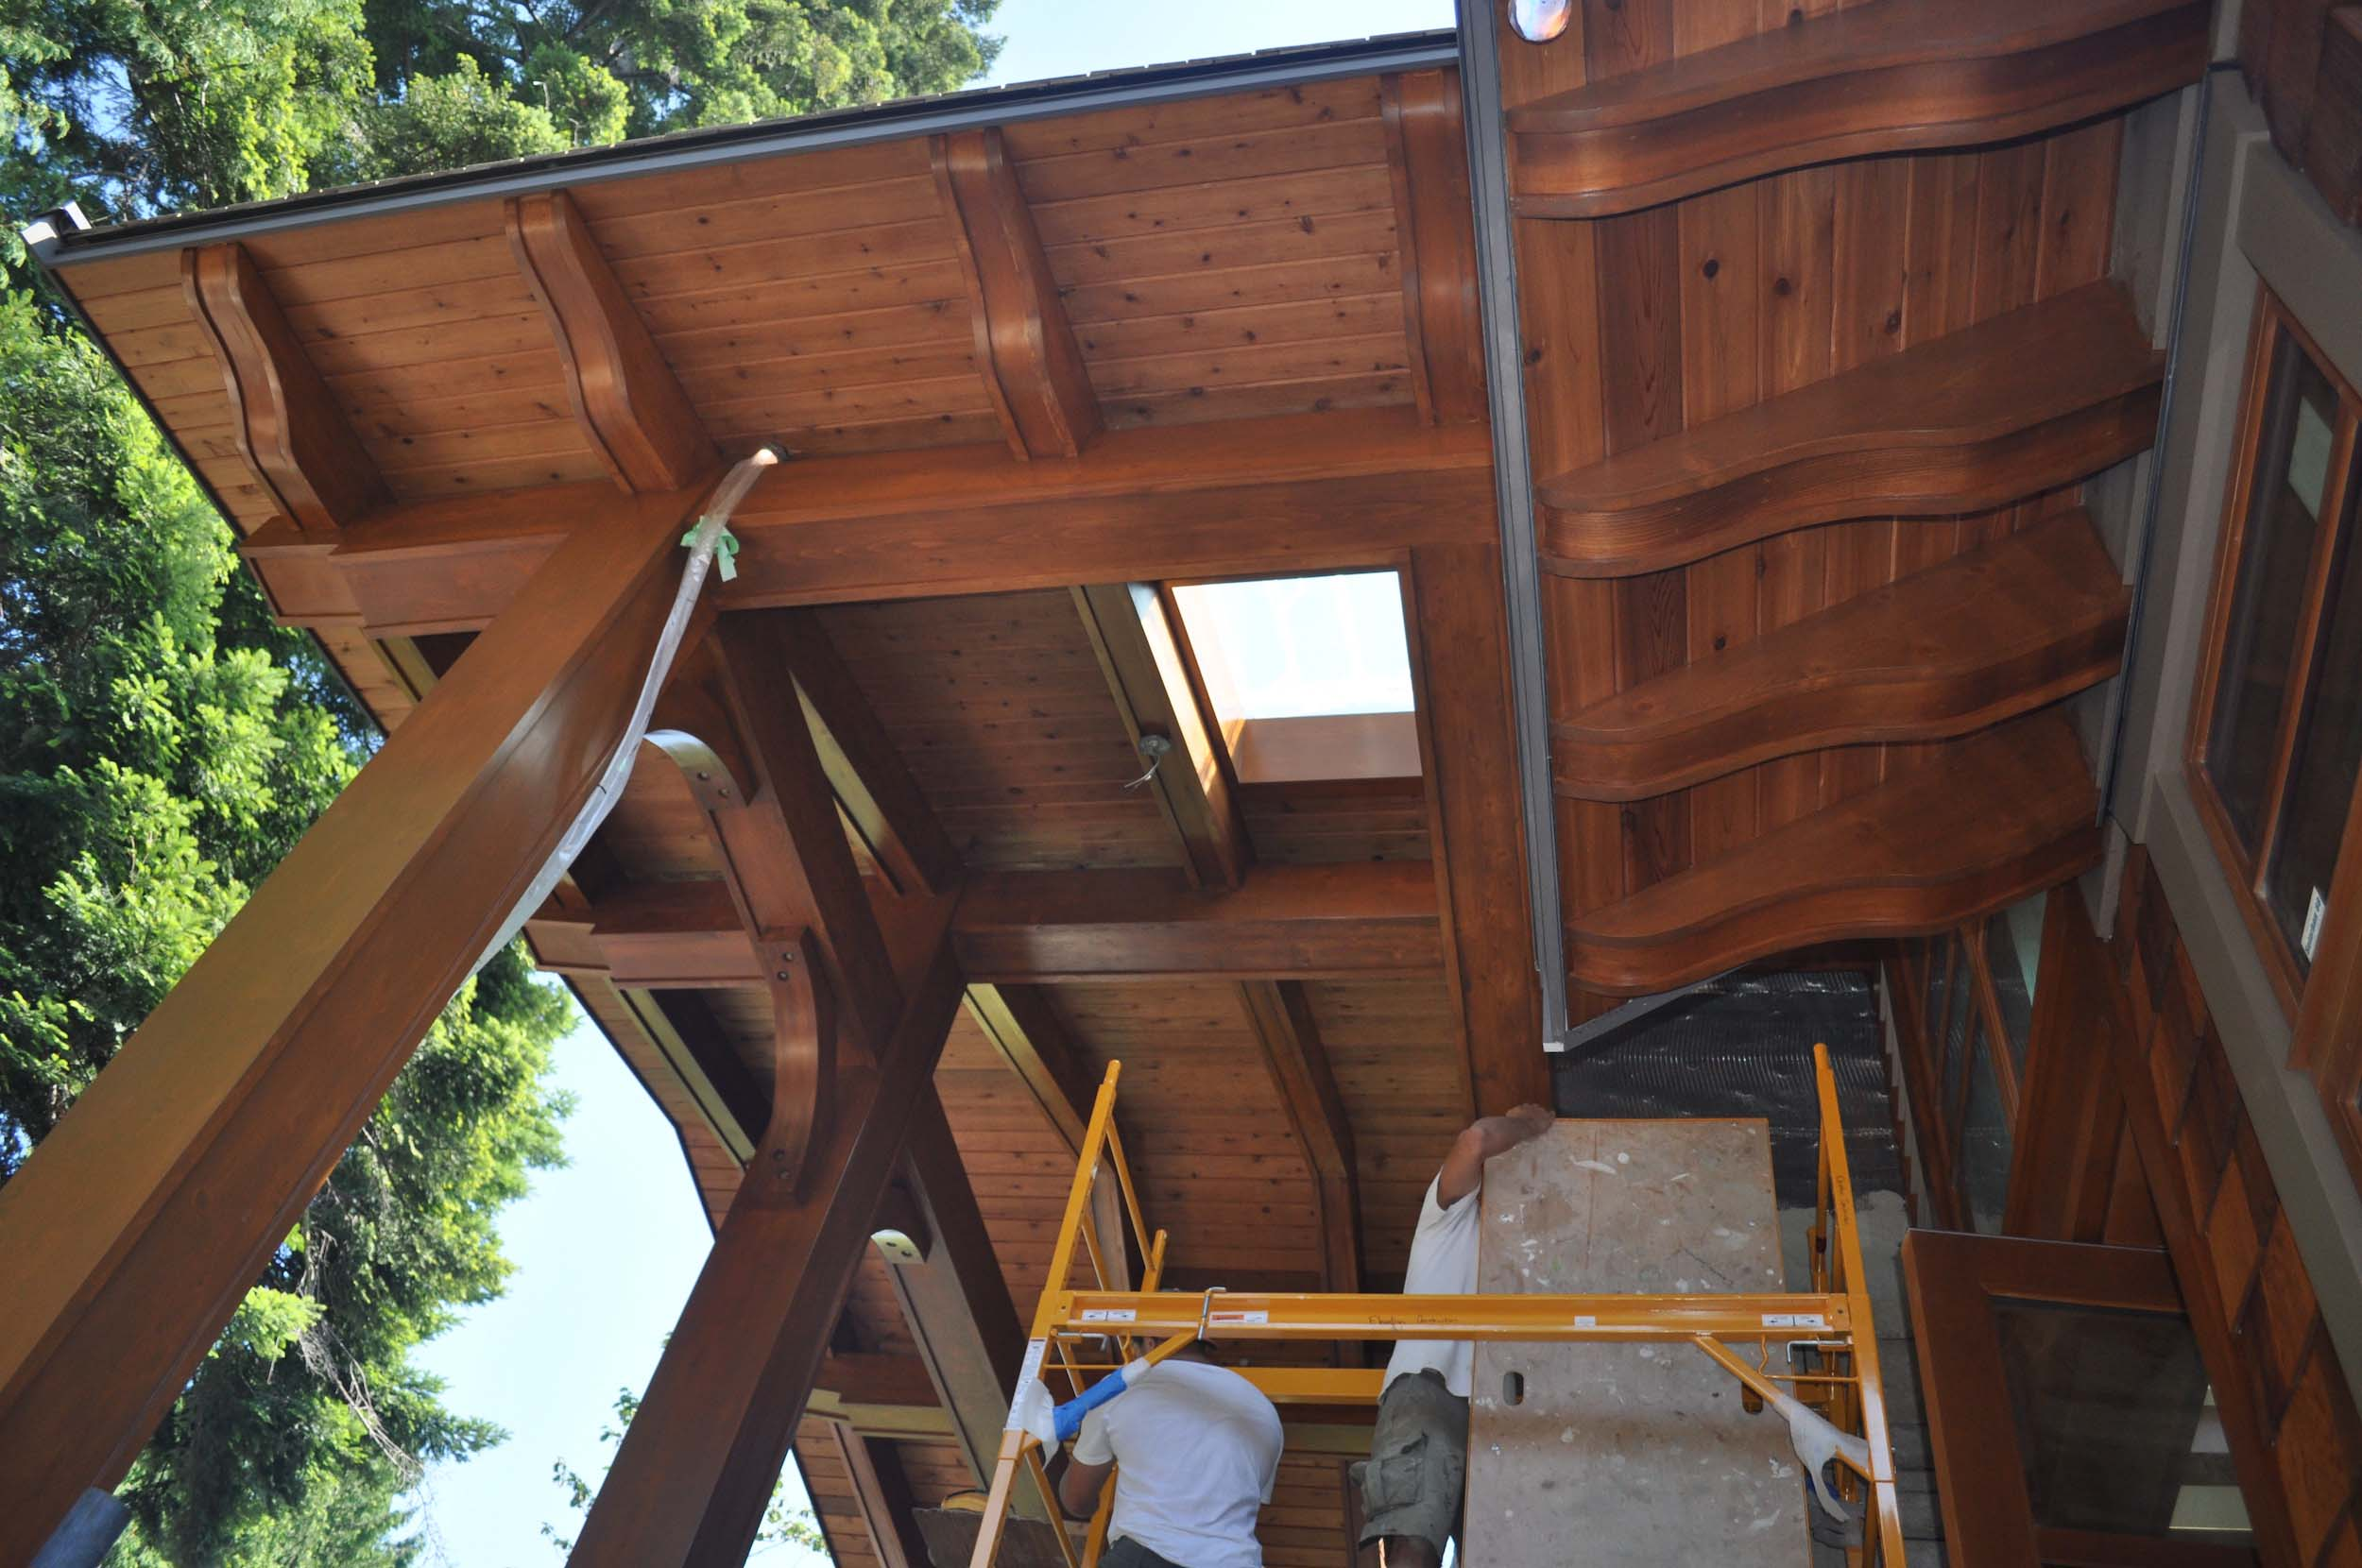 Postle_Construction_ExteriorCladding30.jpg